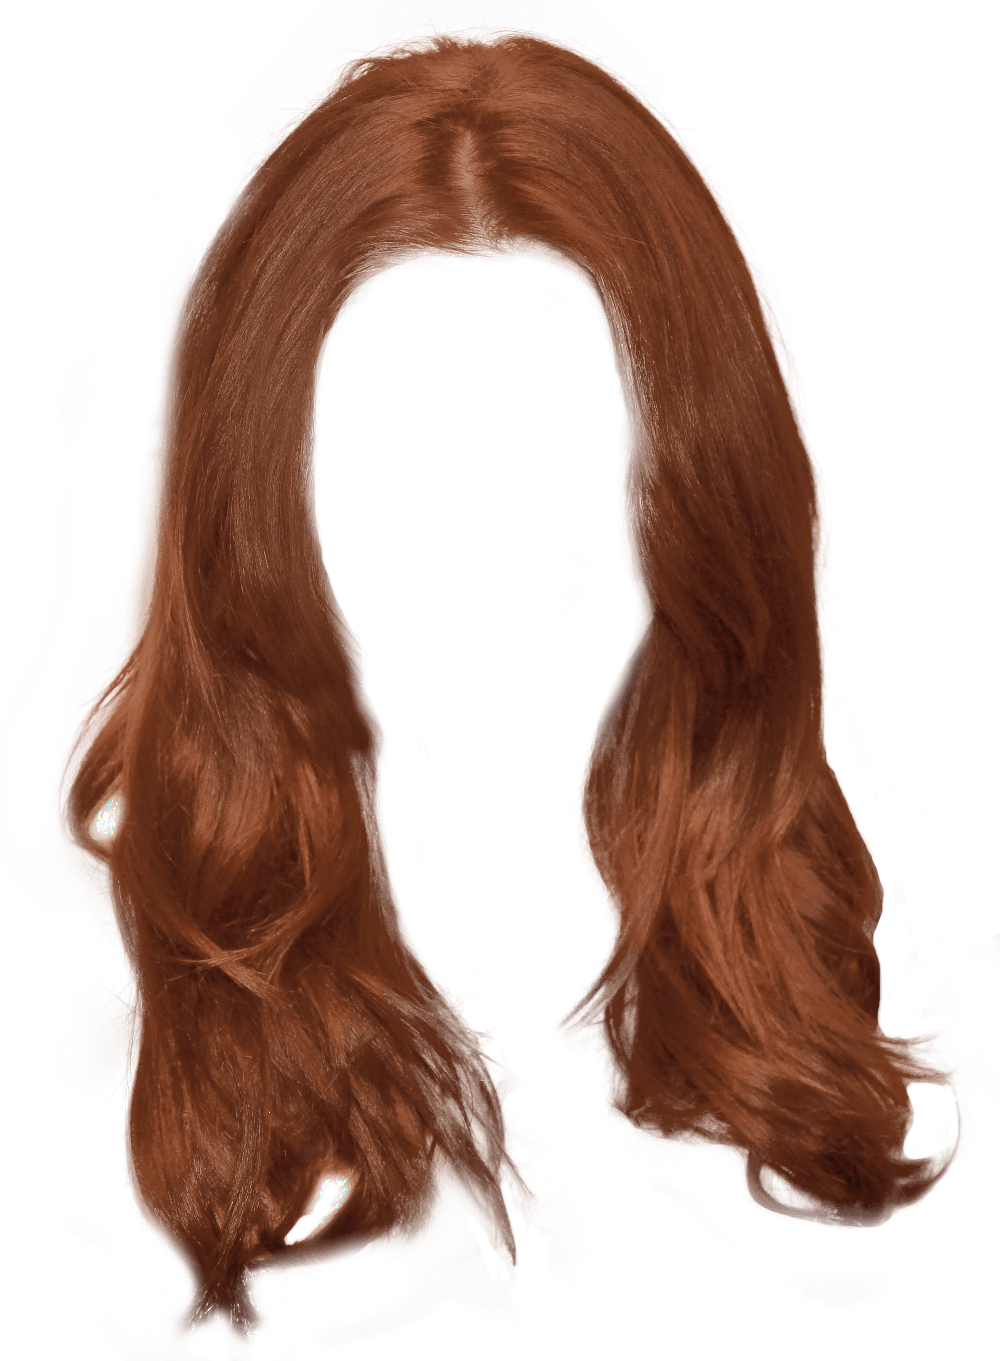 Women Hair Png Image PNG Image - Hair PNG